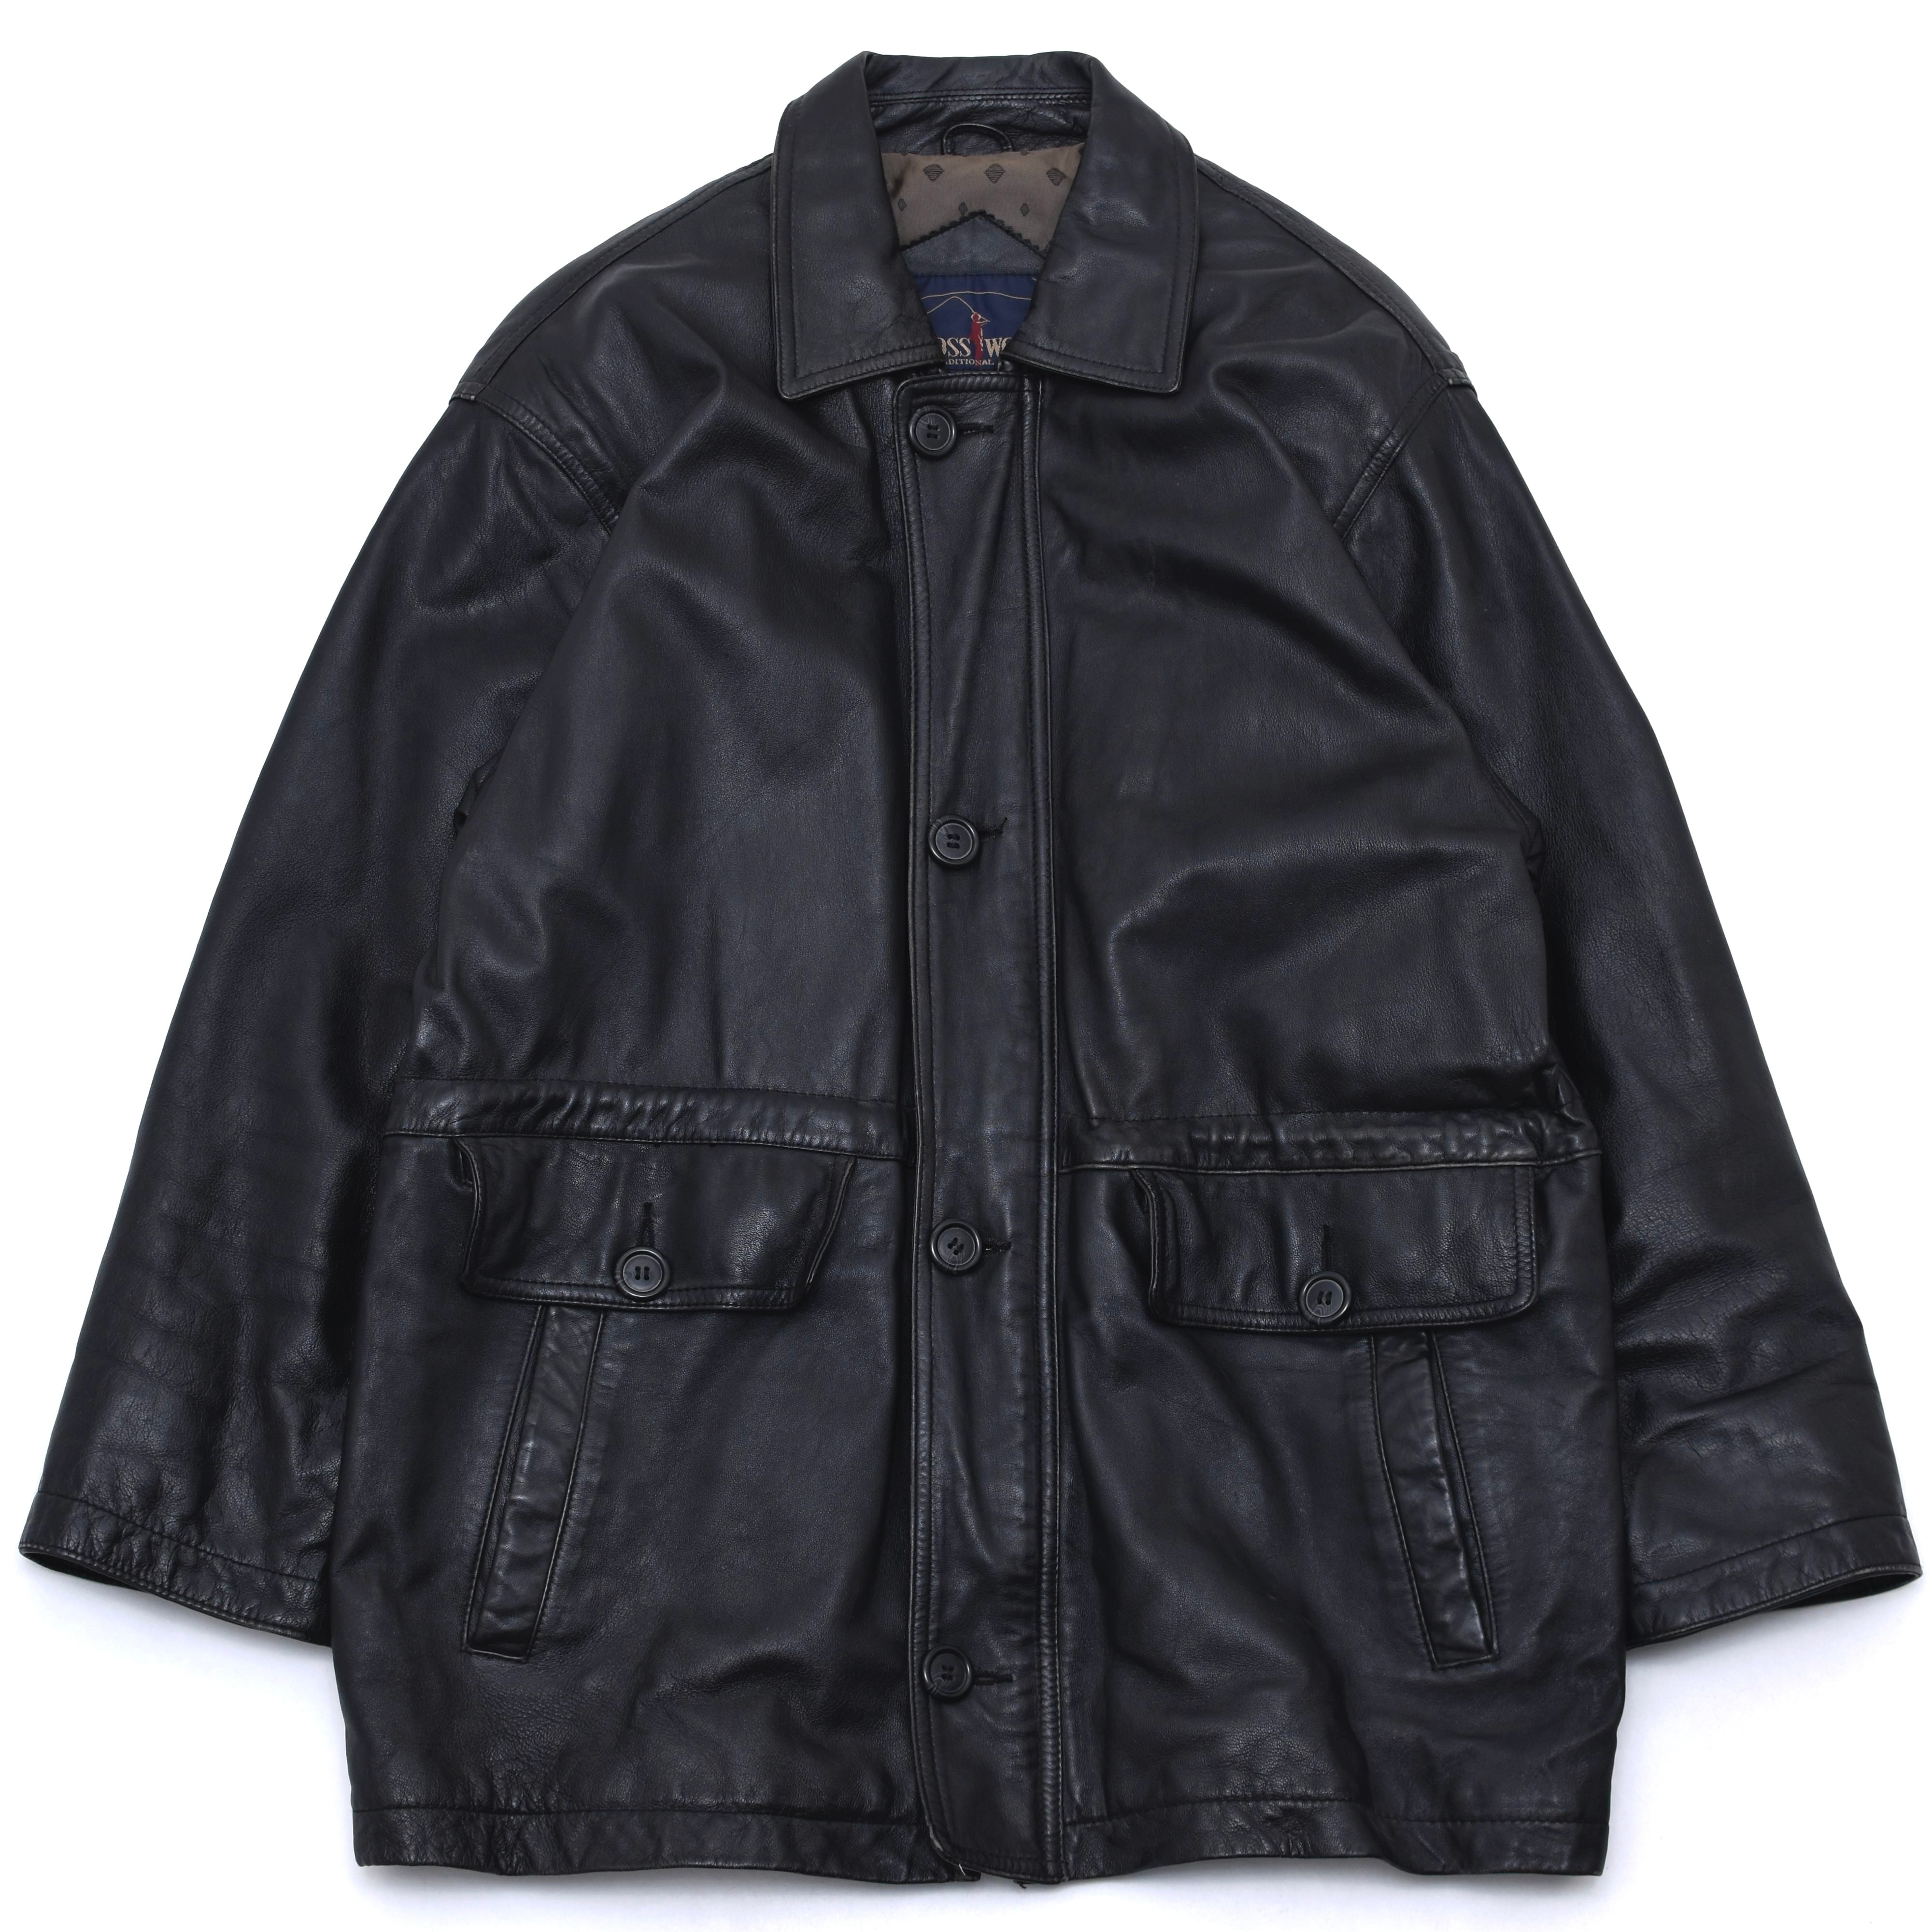 Black lamb leather coat